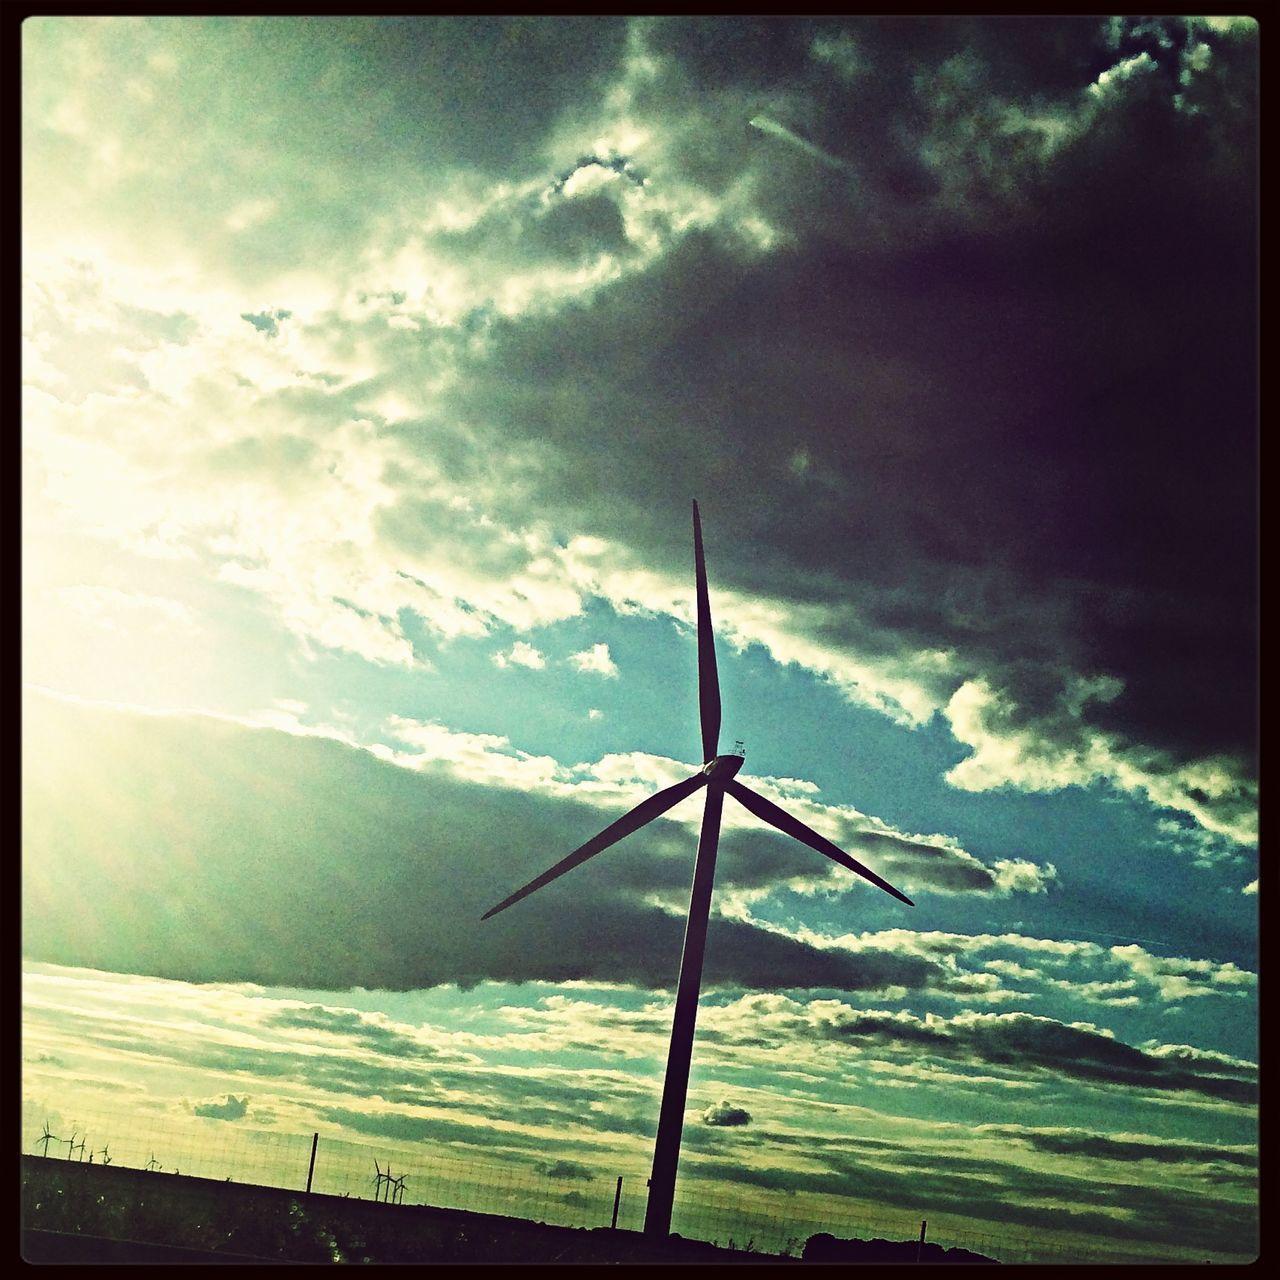 Windmill Against Cloudy Sky